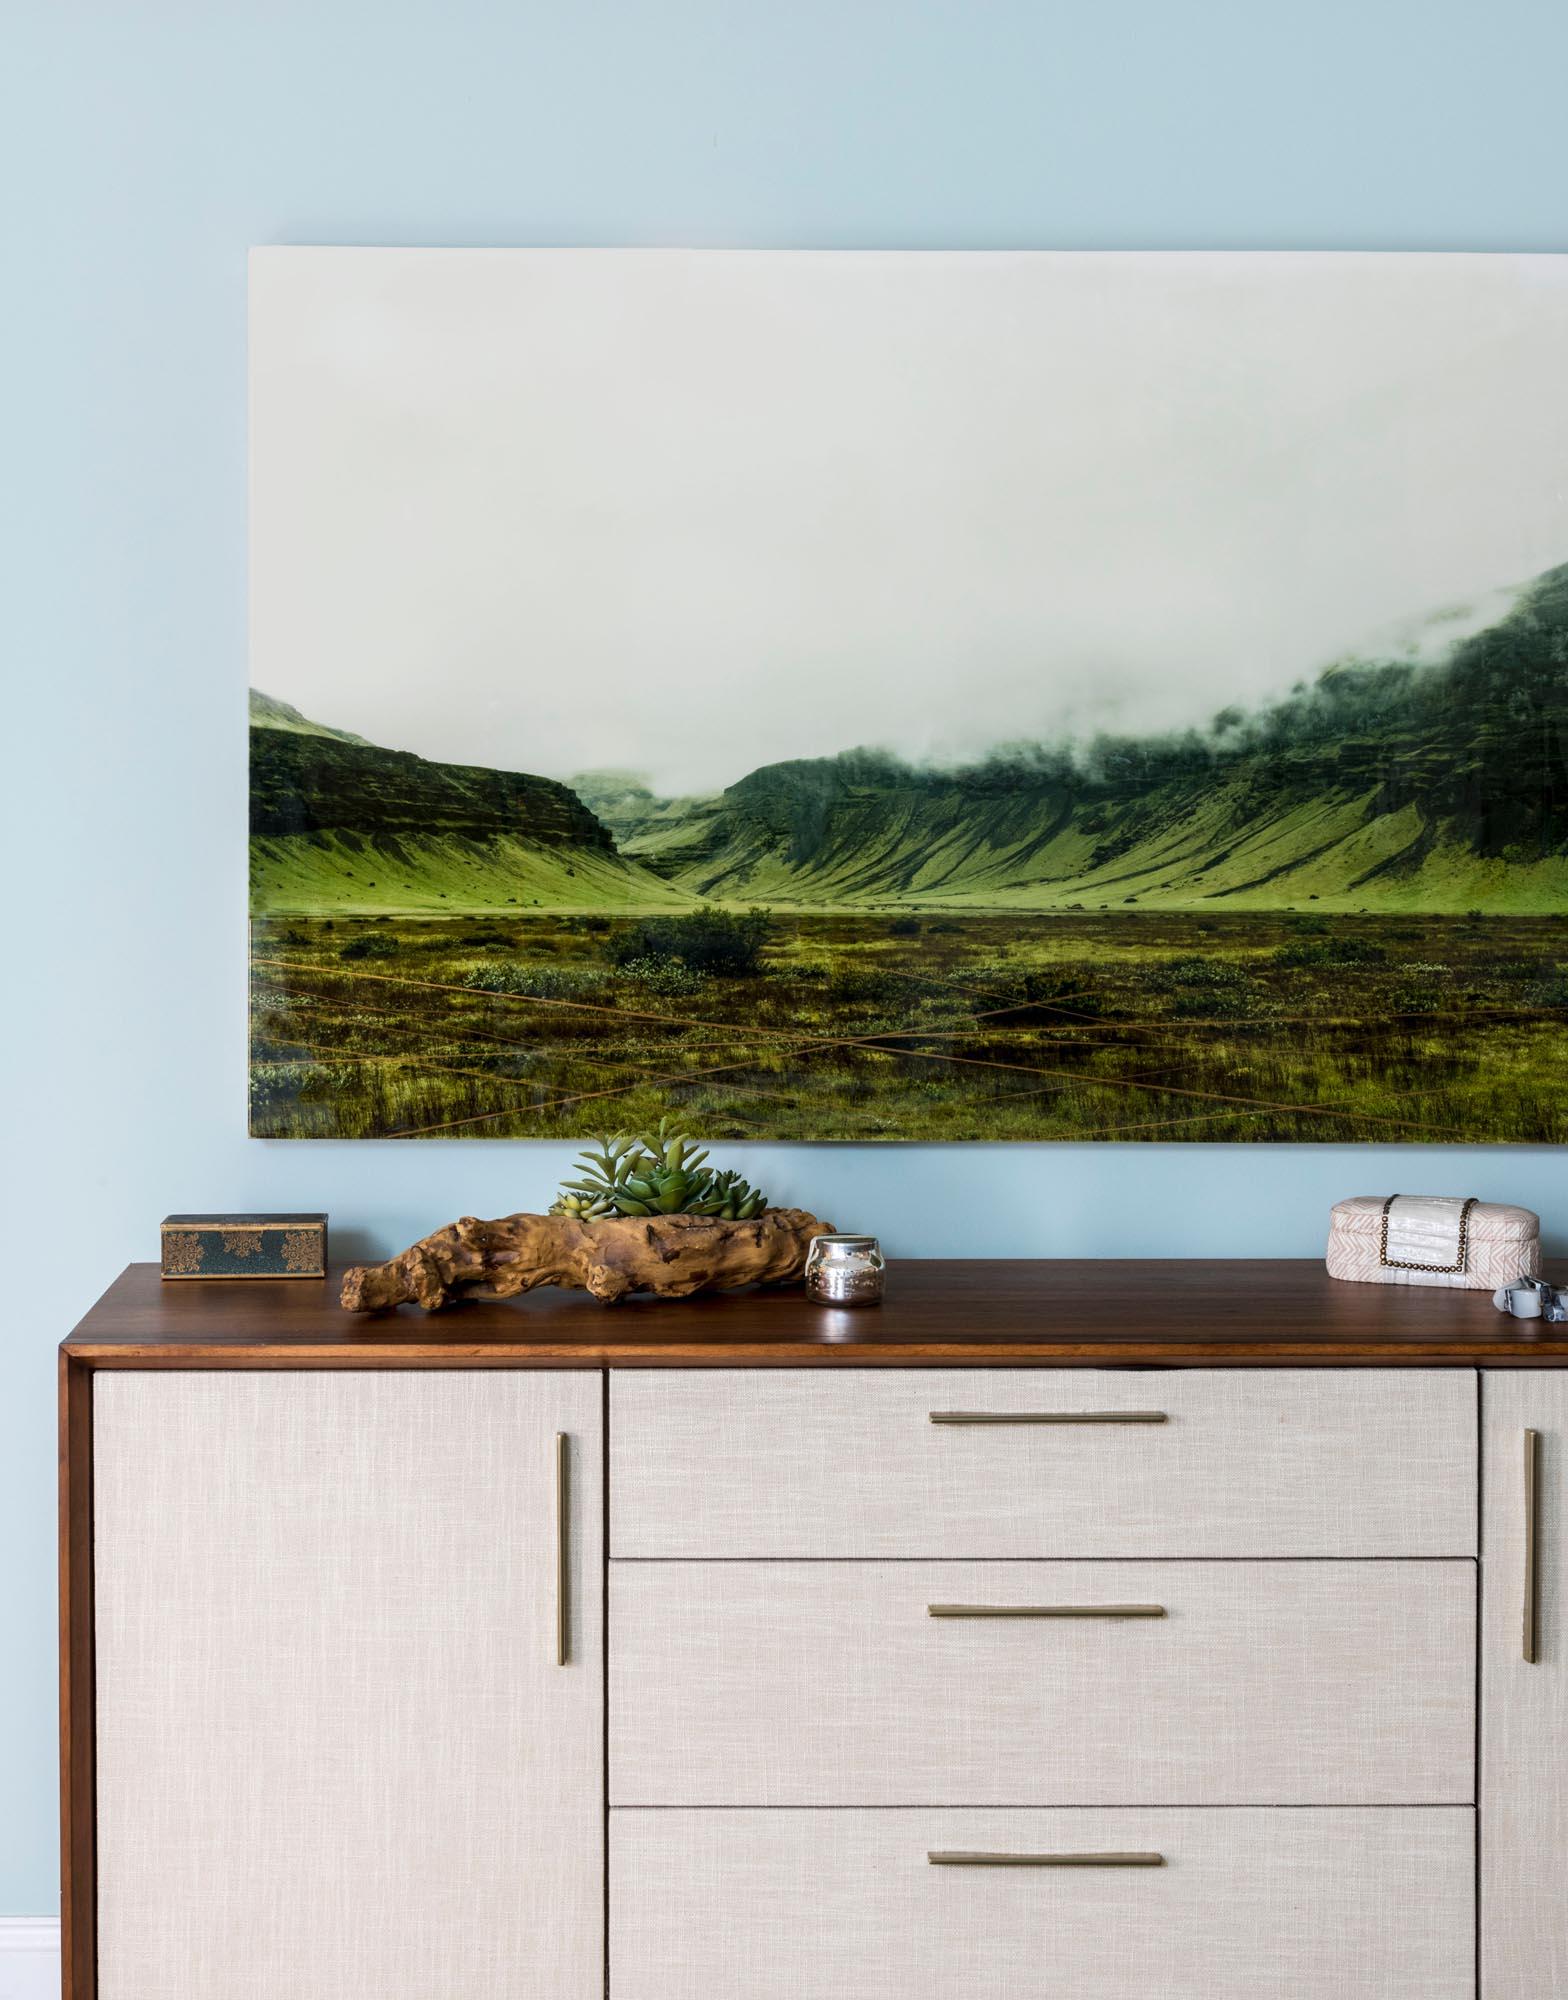 sideboard_landscape_bedroom_charlestown_townhouse_daneaustindesign_sabrinabaloun_Bijou_.jpg